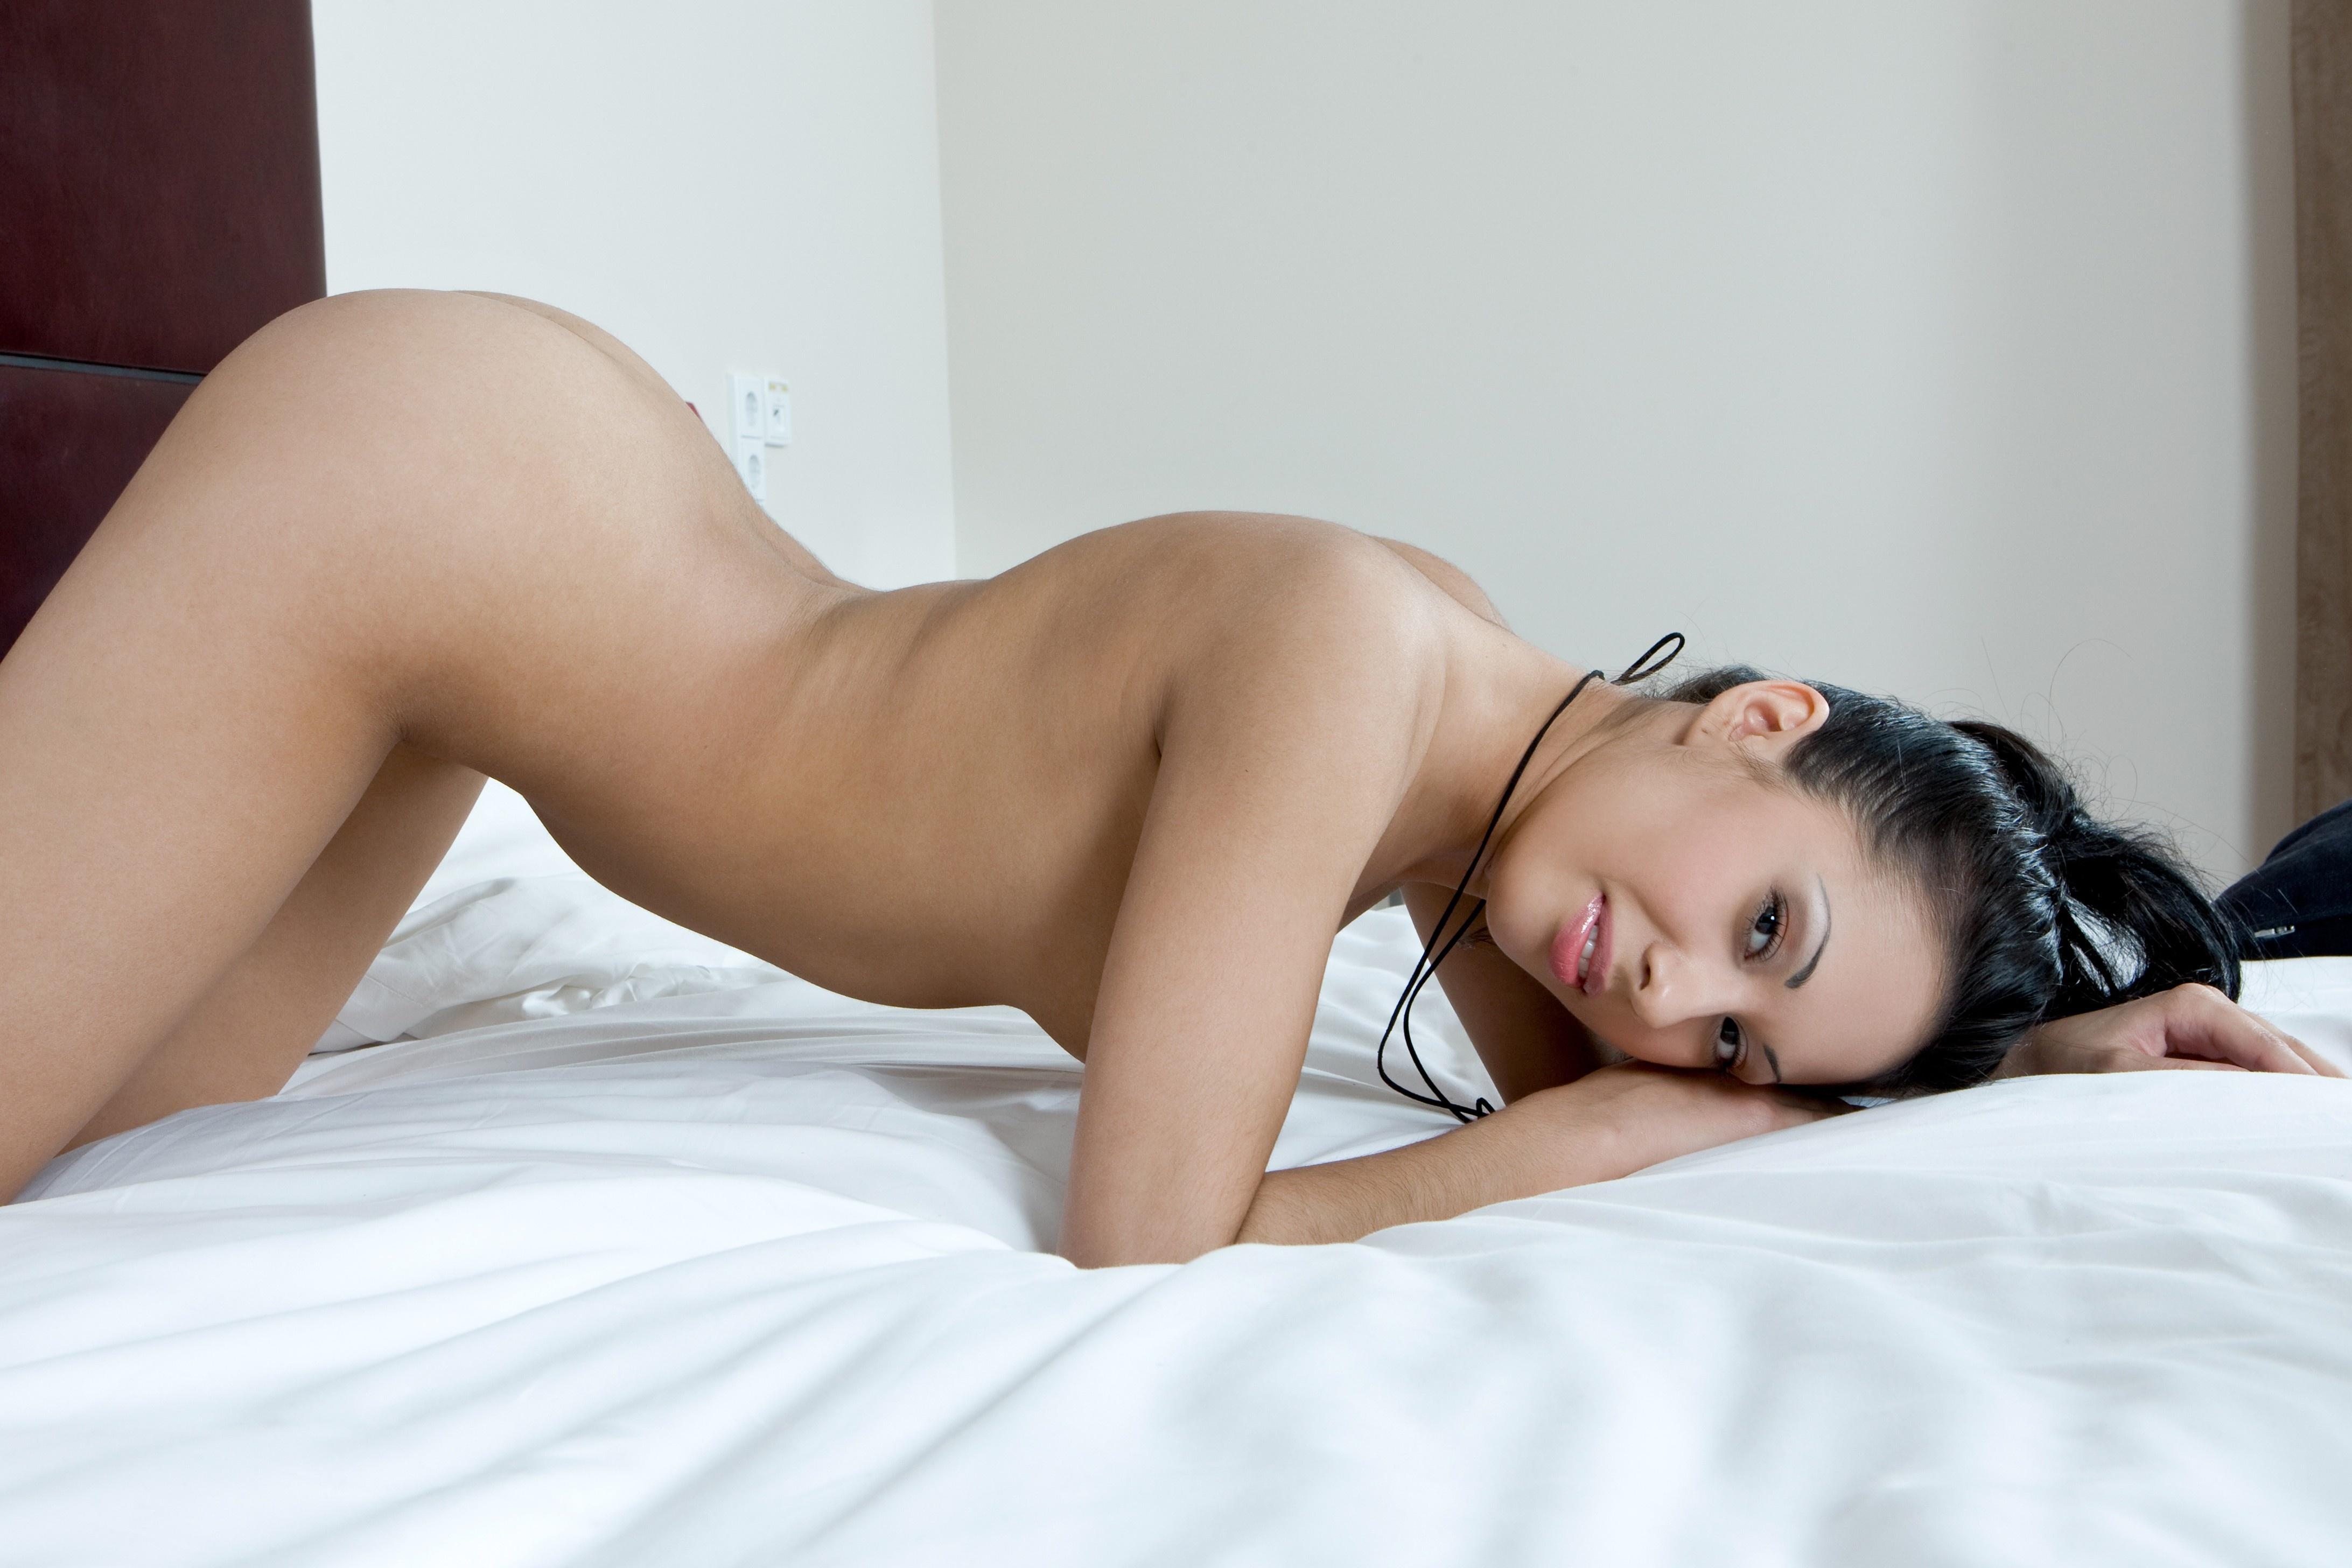 Mature naked bbw pussy pics